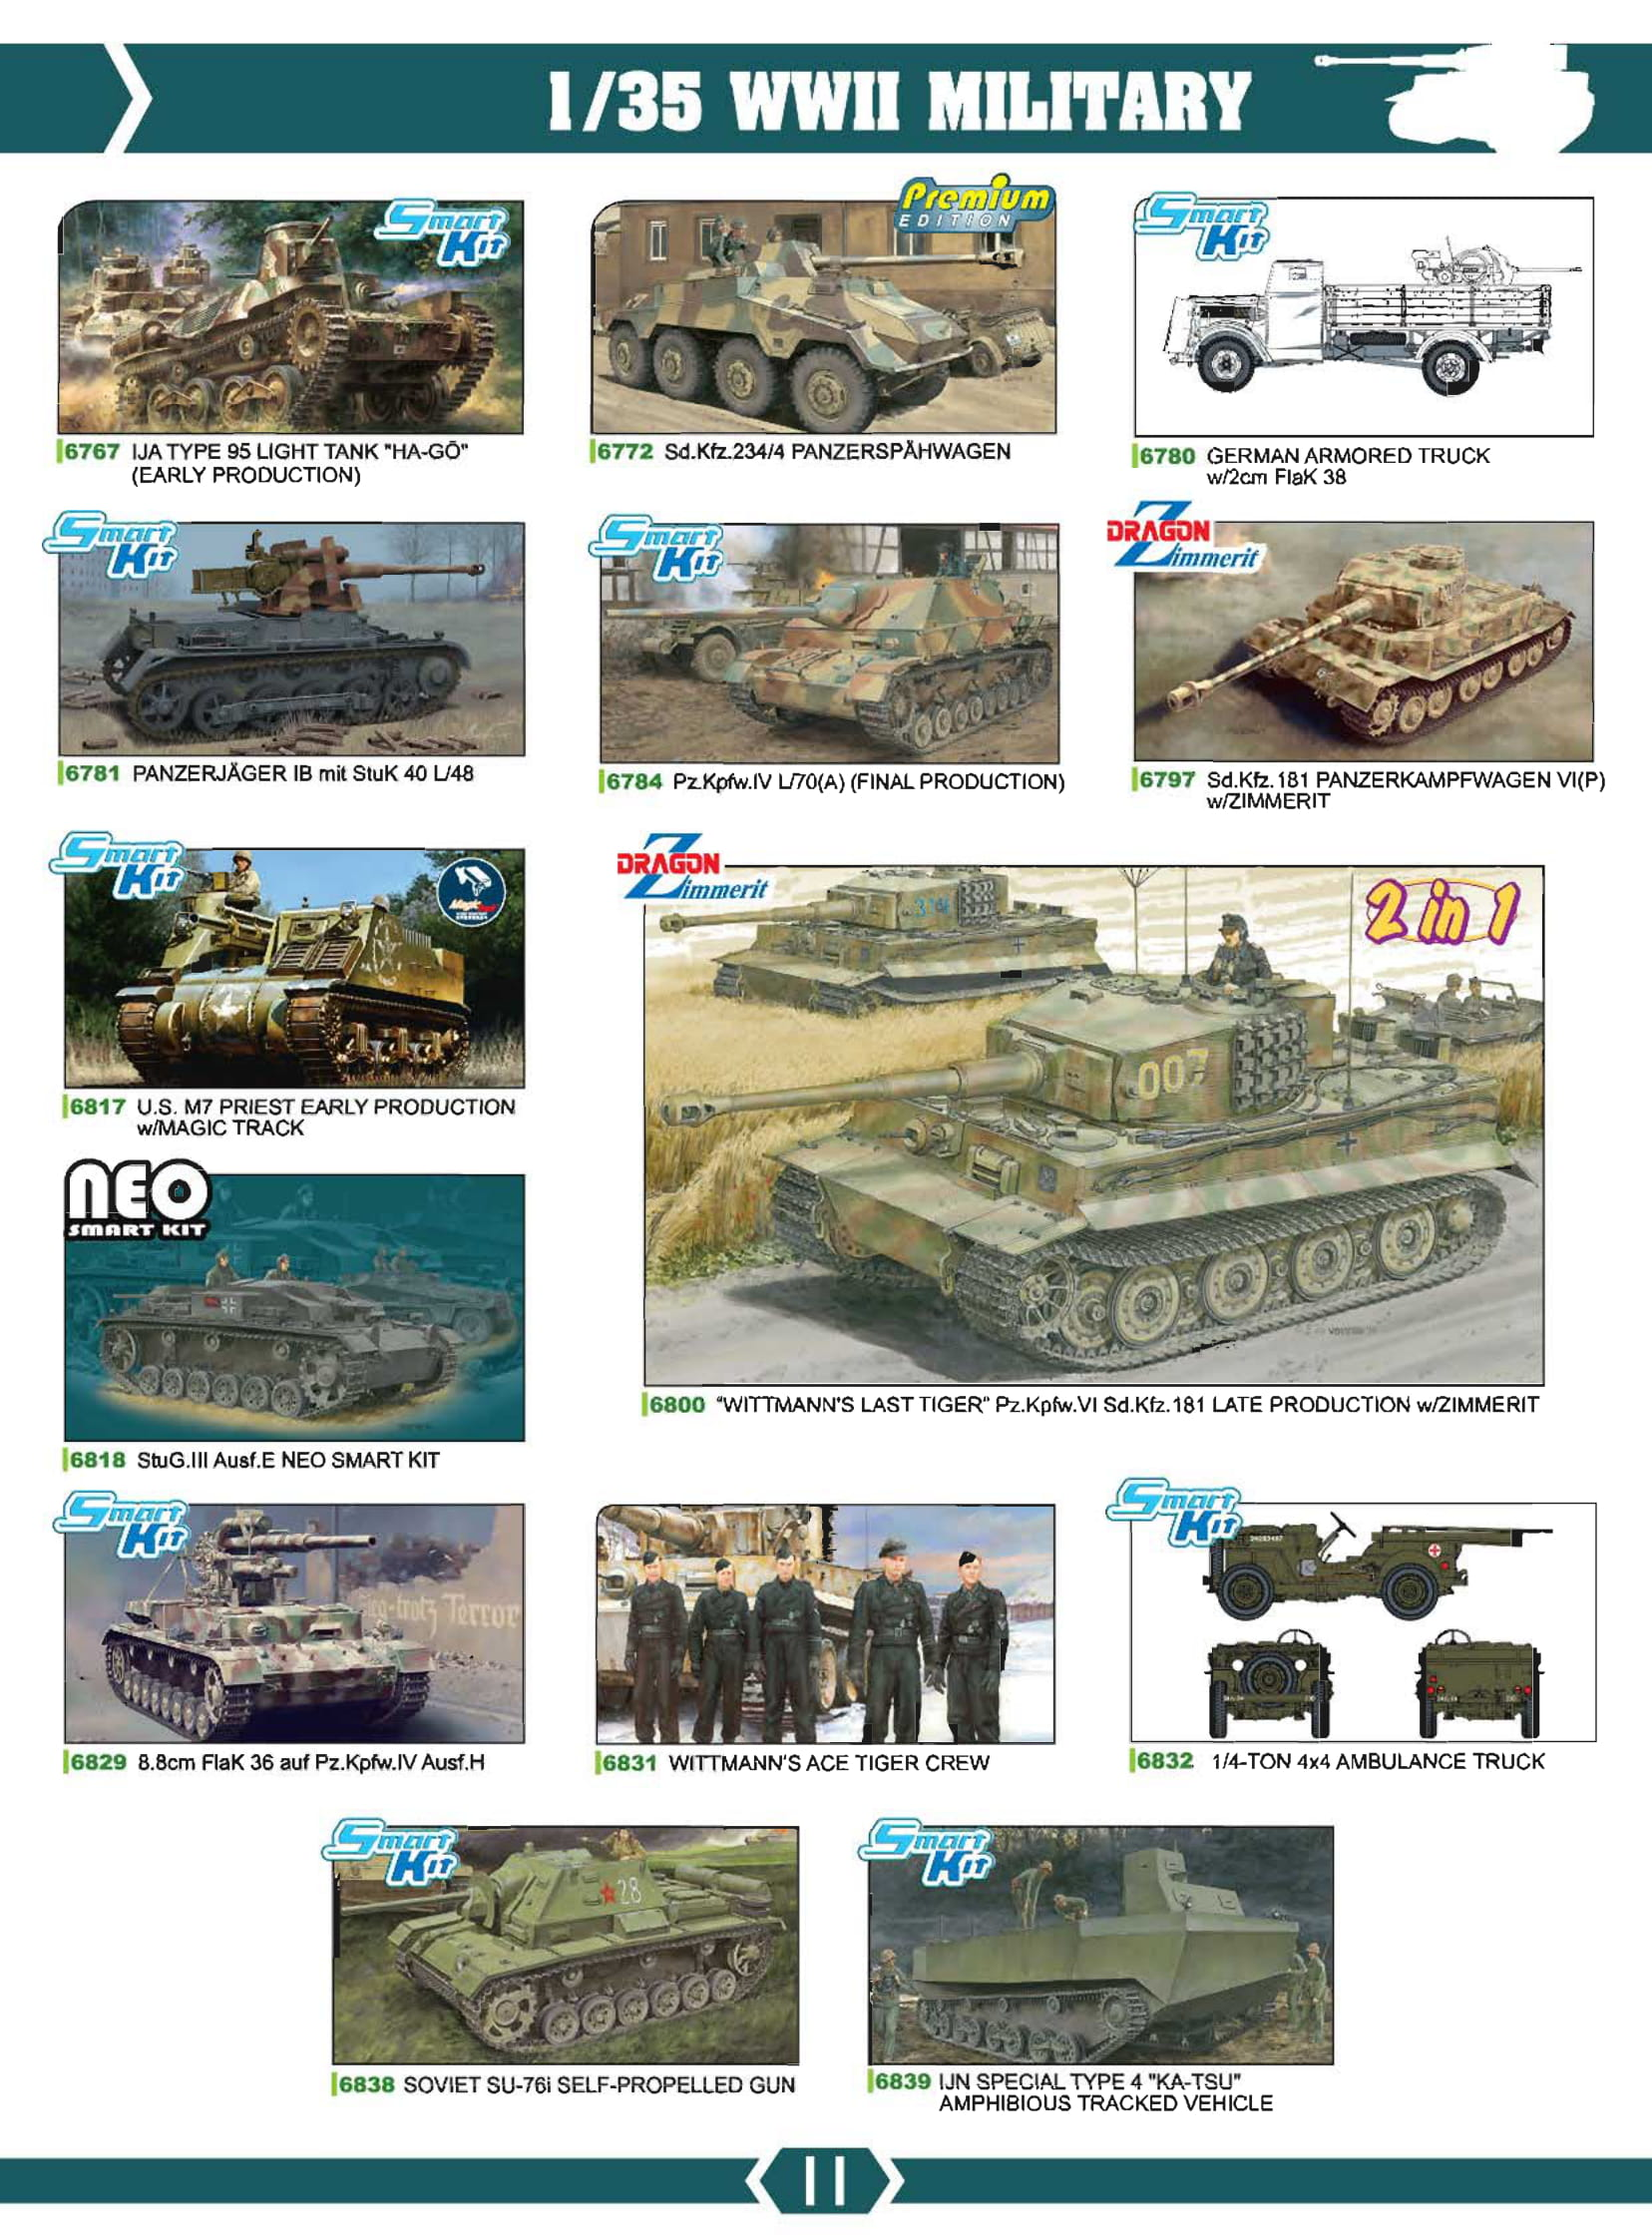 Ukraine Ussr 1944 234//4 1:72 Carro//Panzer//Tanks//Military SD.KFZ 10p